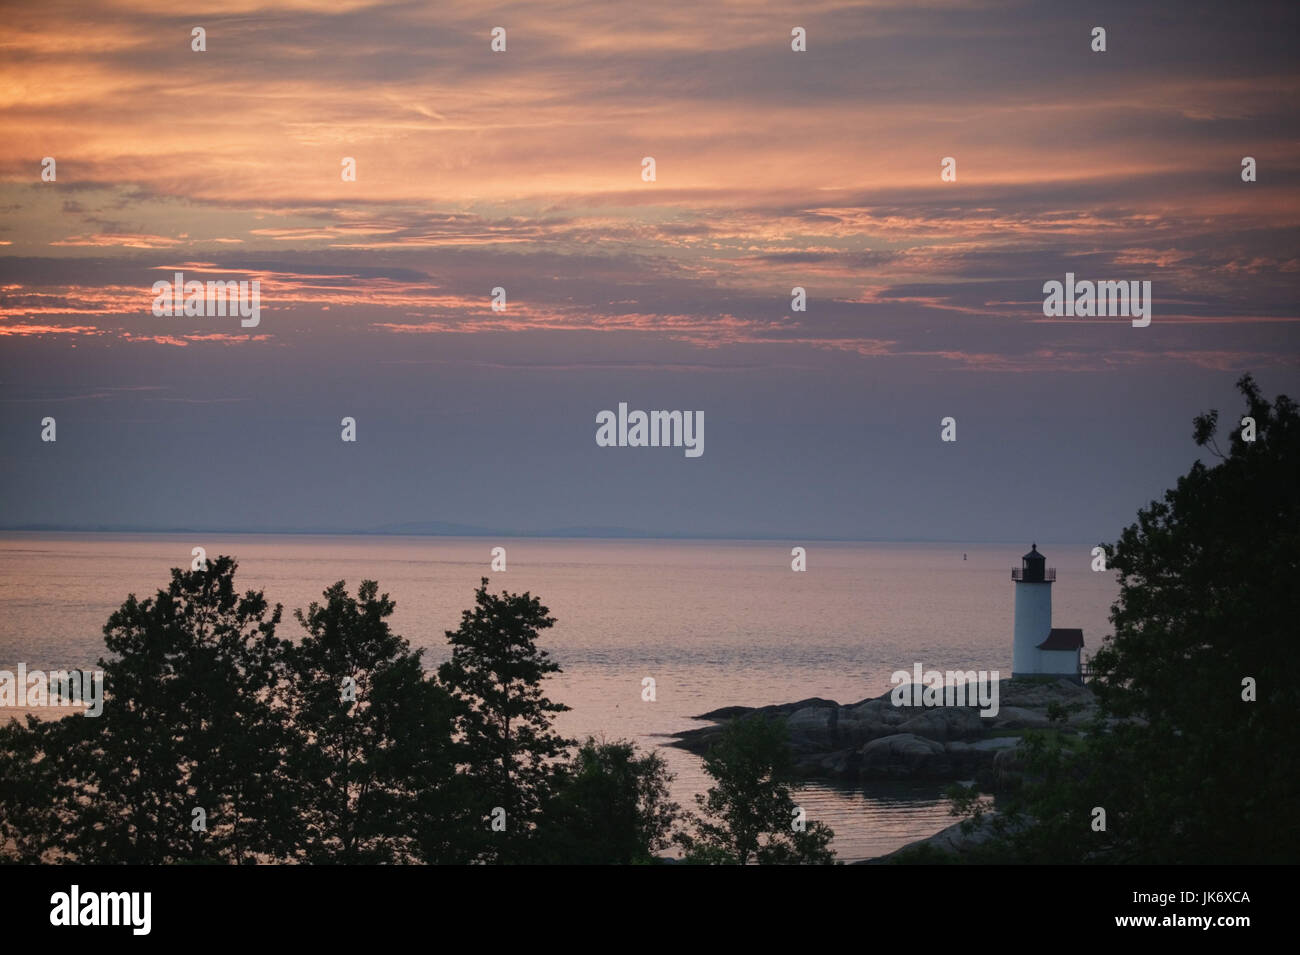 USA, Massachusetts, Gloucester, Annisquam Lighthaus, werden Amerika, Nordamerika, Küstengebiet, Küstenlandschaft, Stockbild